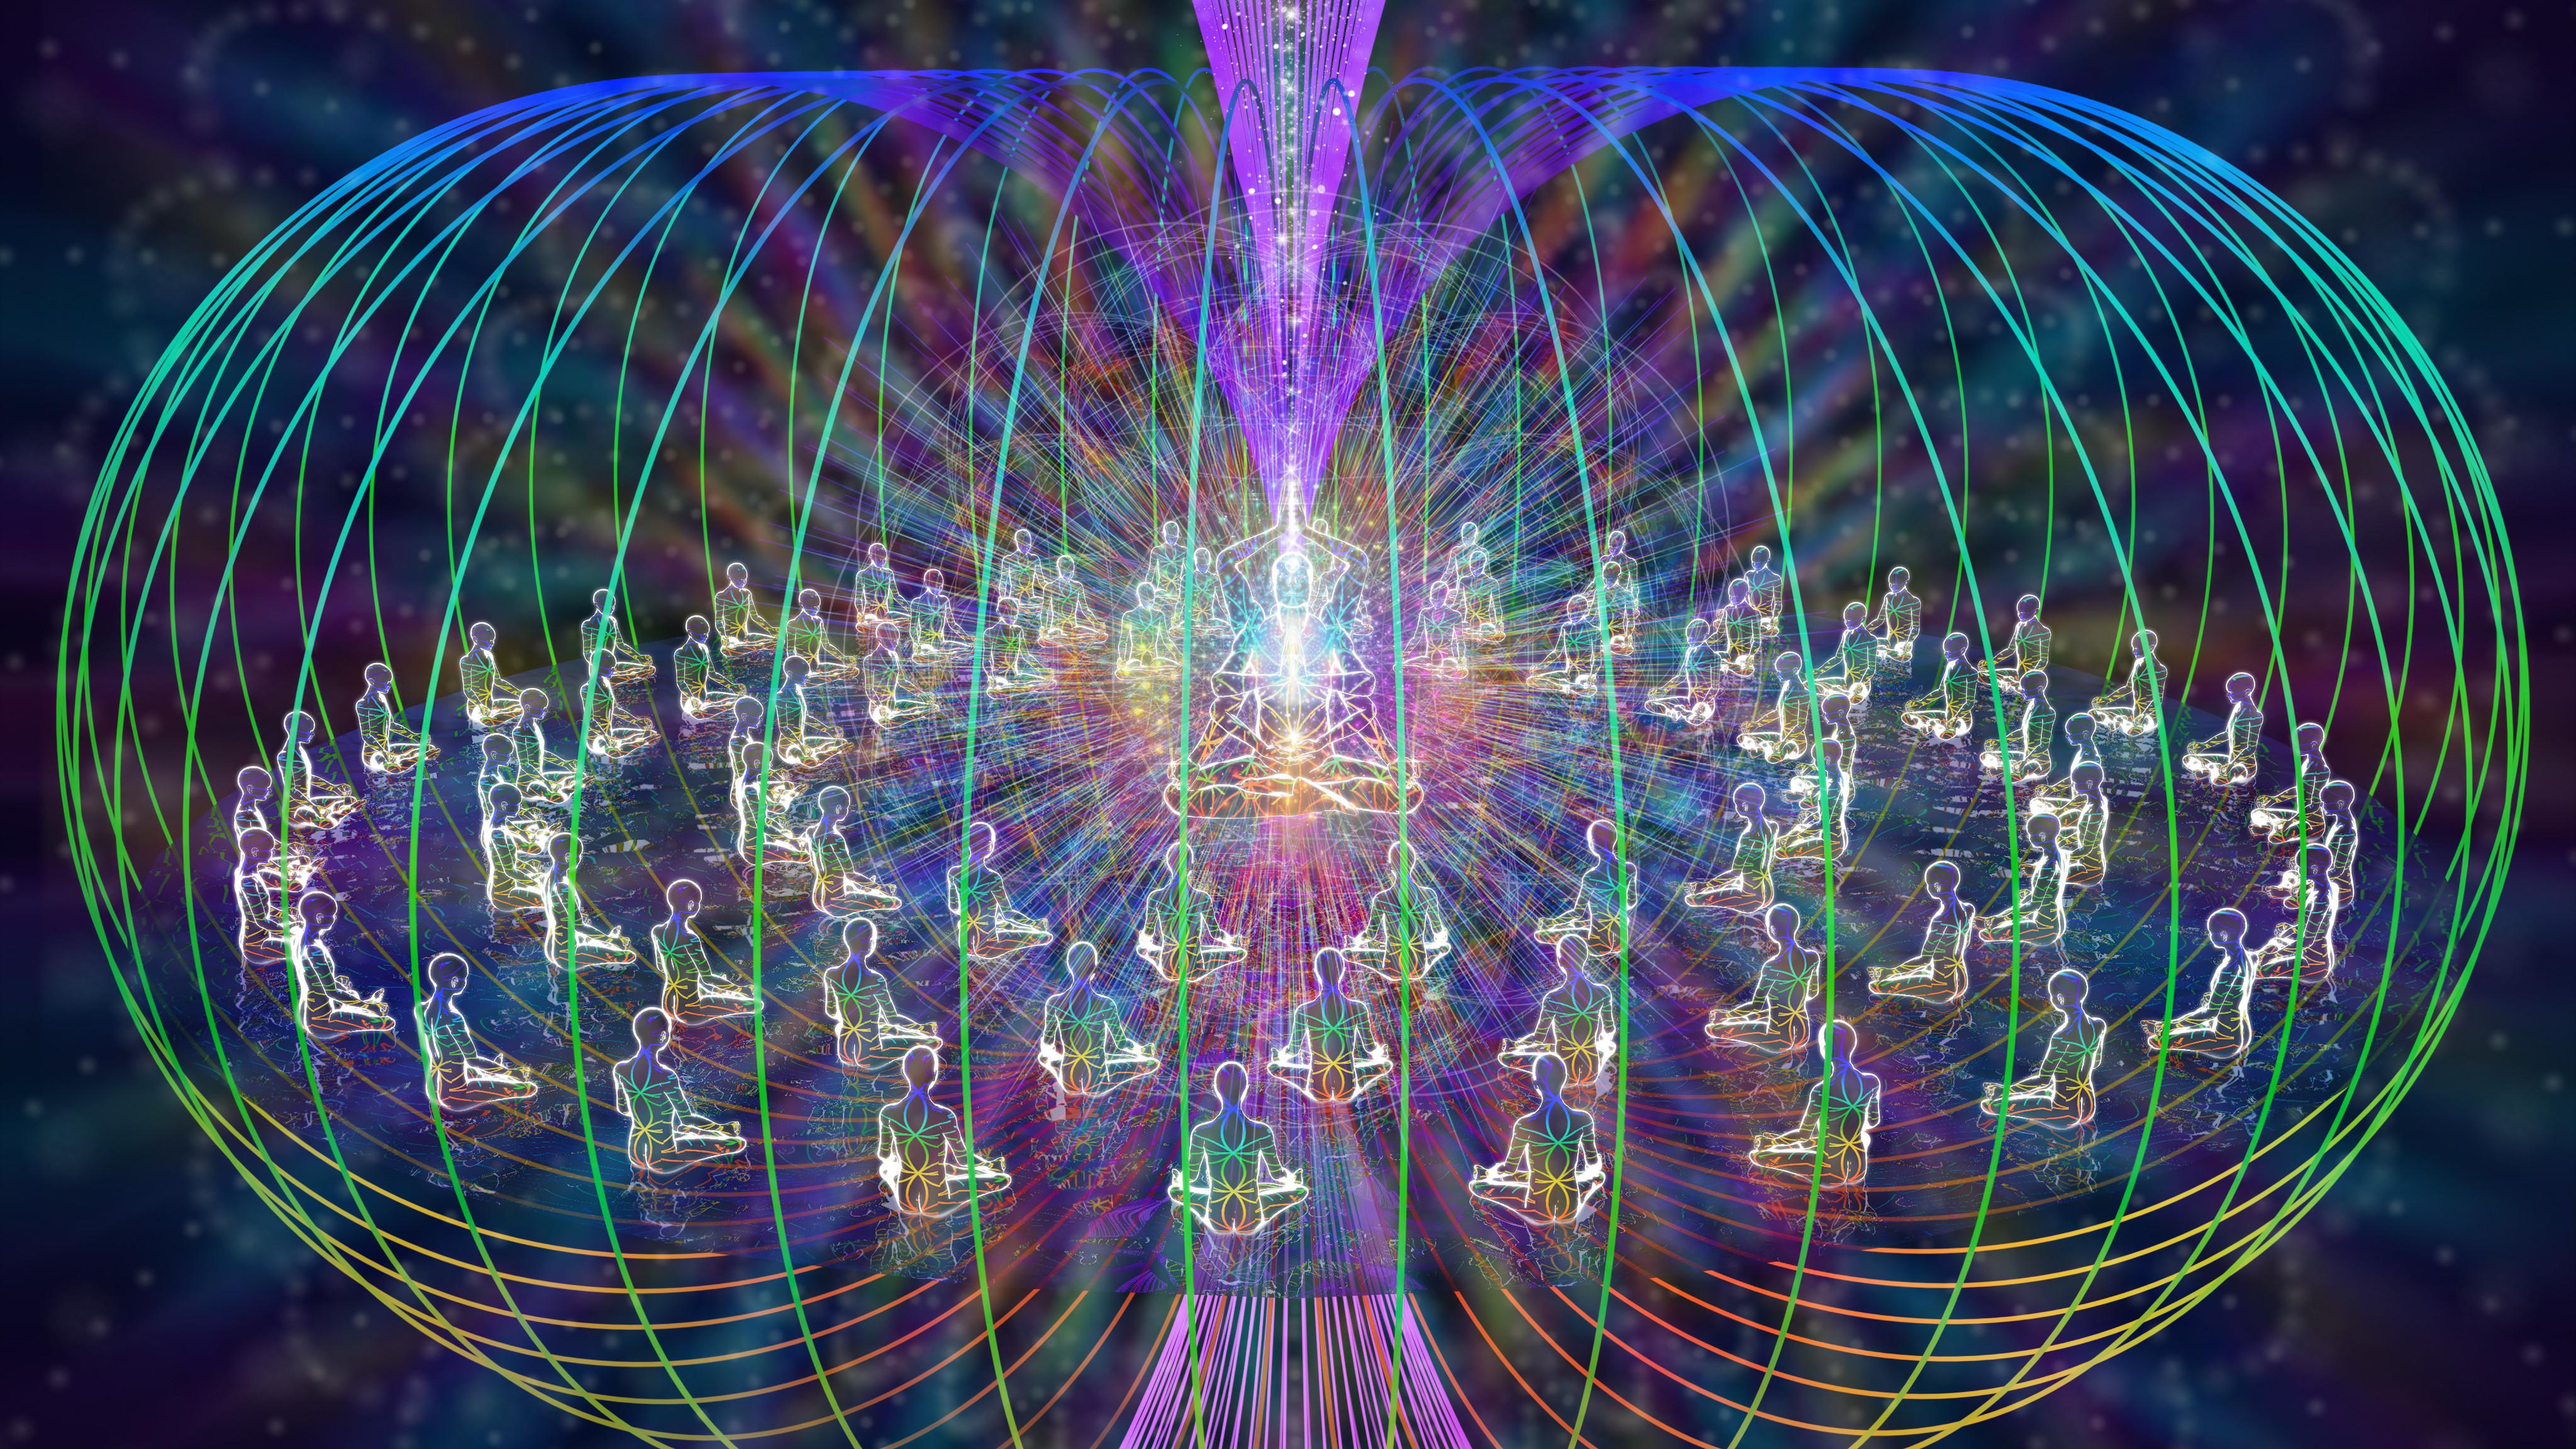 Arrhes - Formation Transfiguration